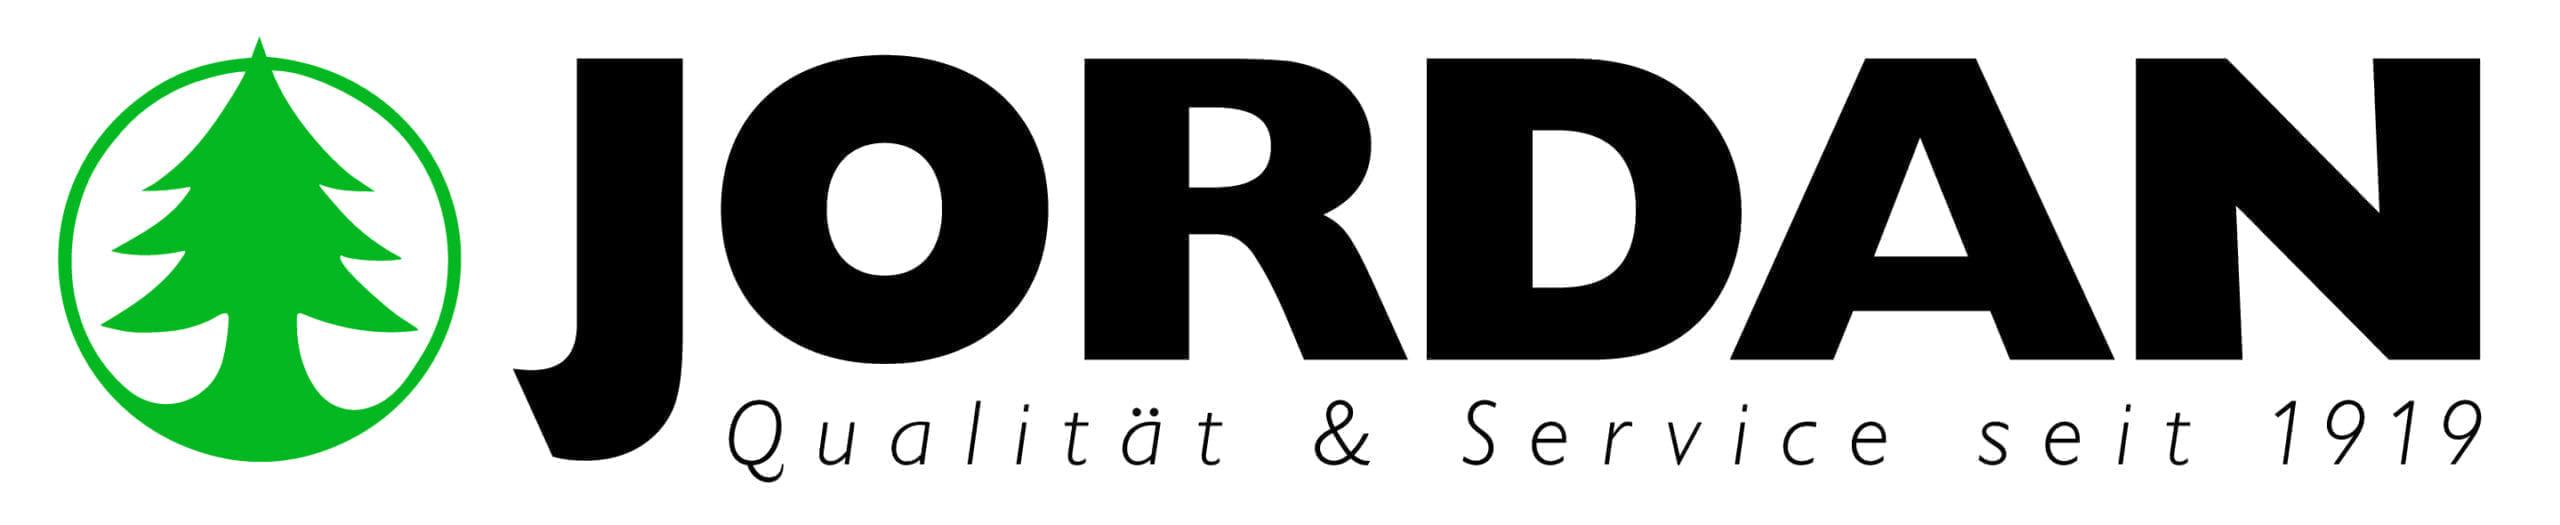 Jordan Qualität & Service seit 1919 logo isenberg